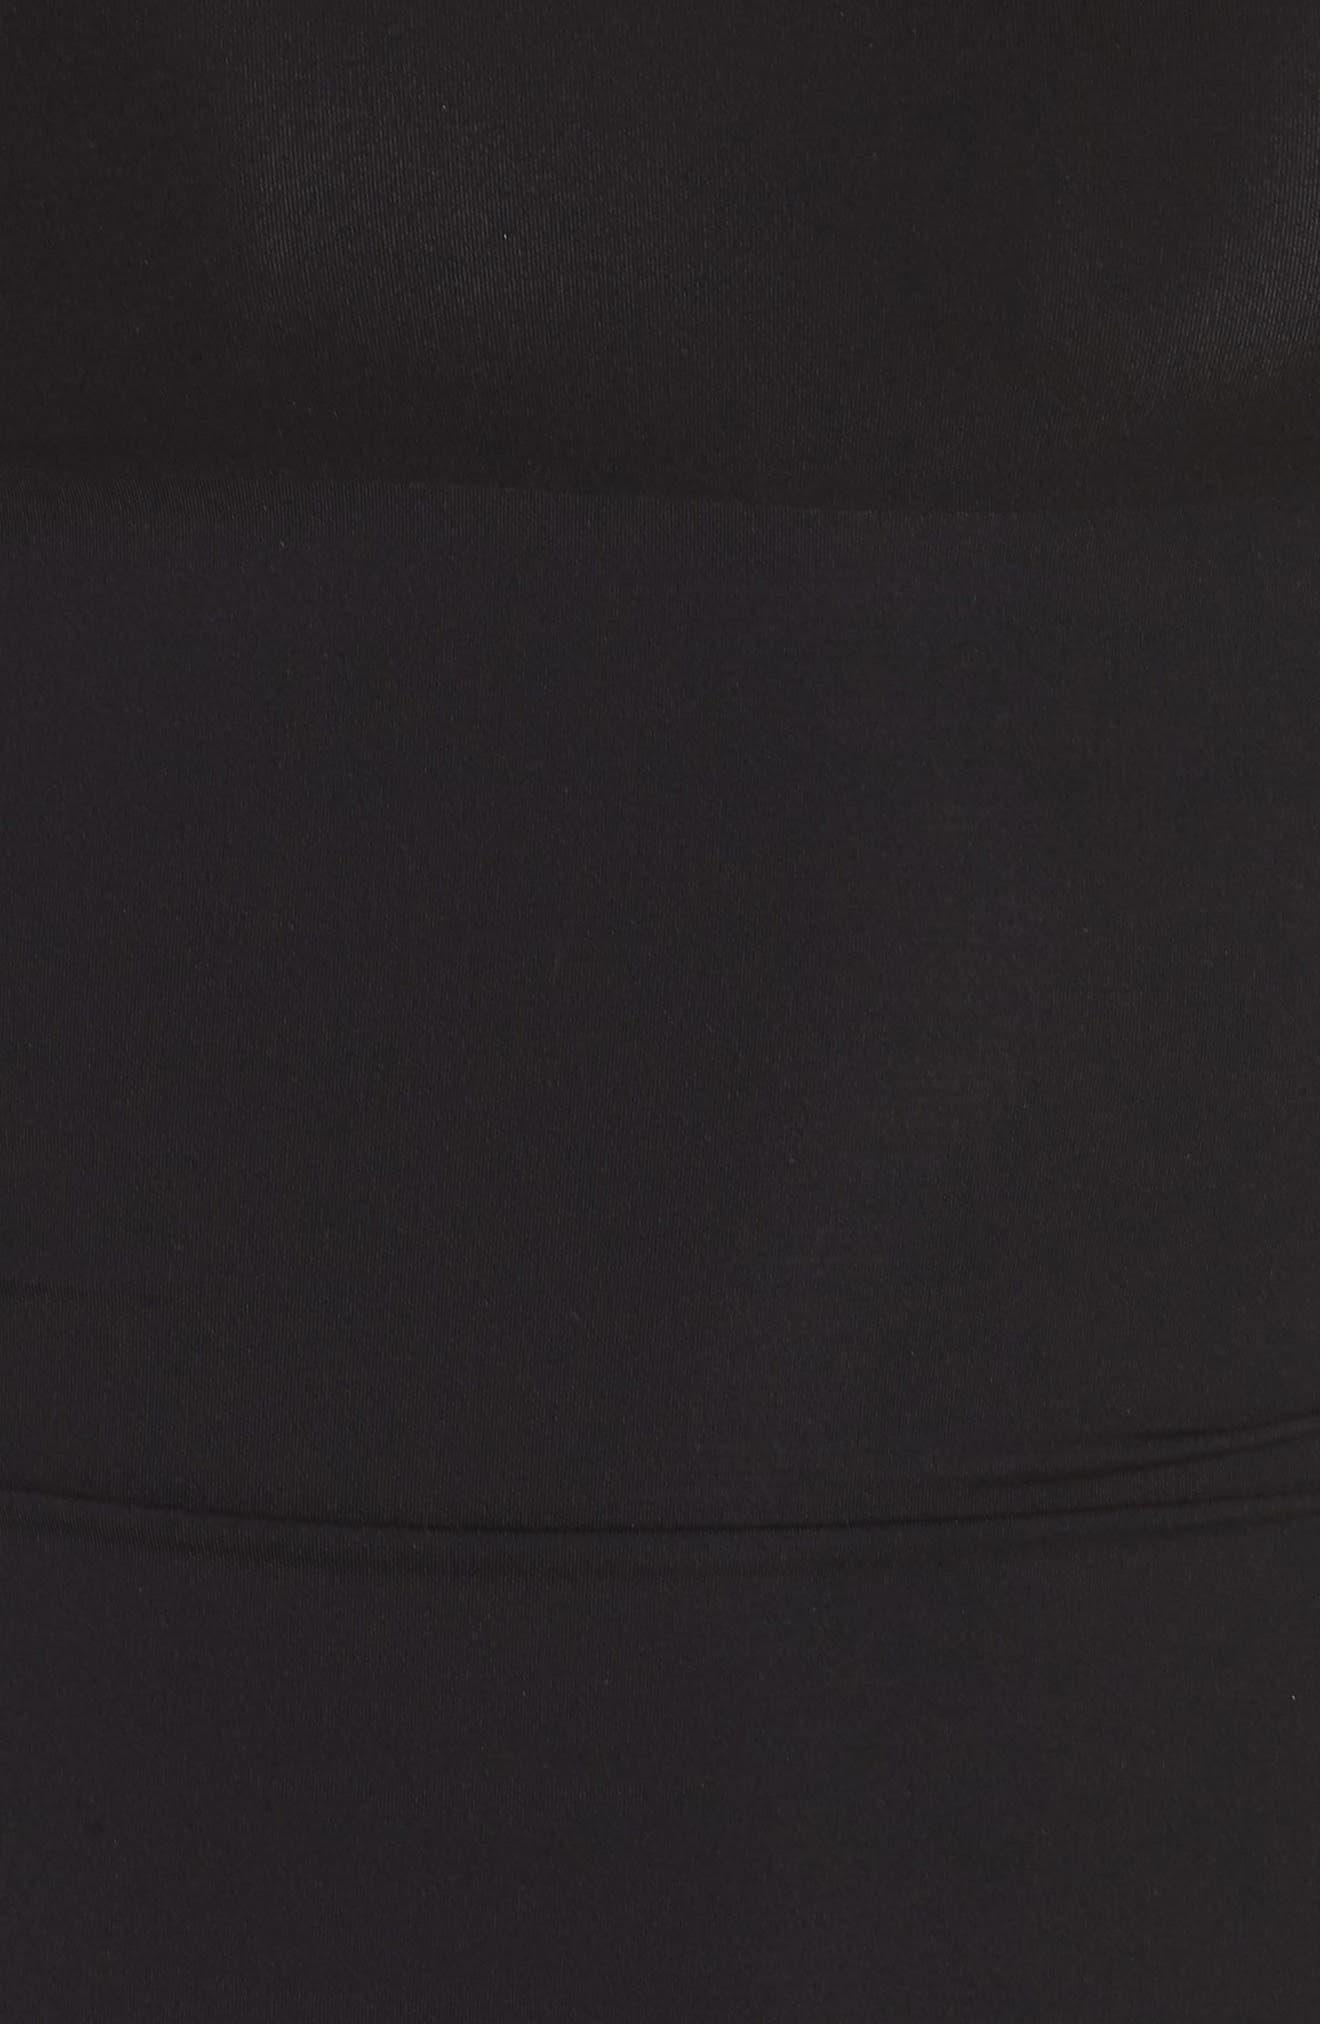 Thinstincts Tank,                             Alternate thumbnail 5, color,                             Very Black